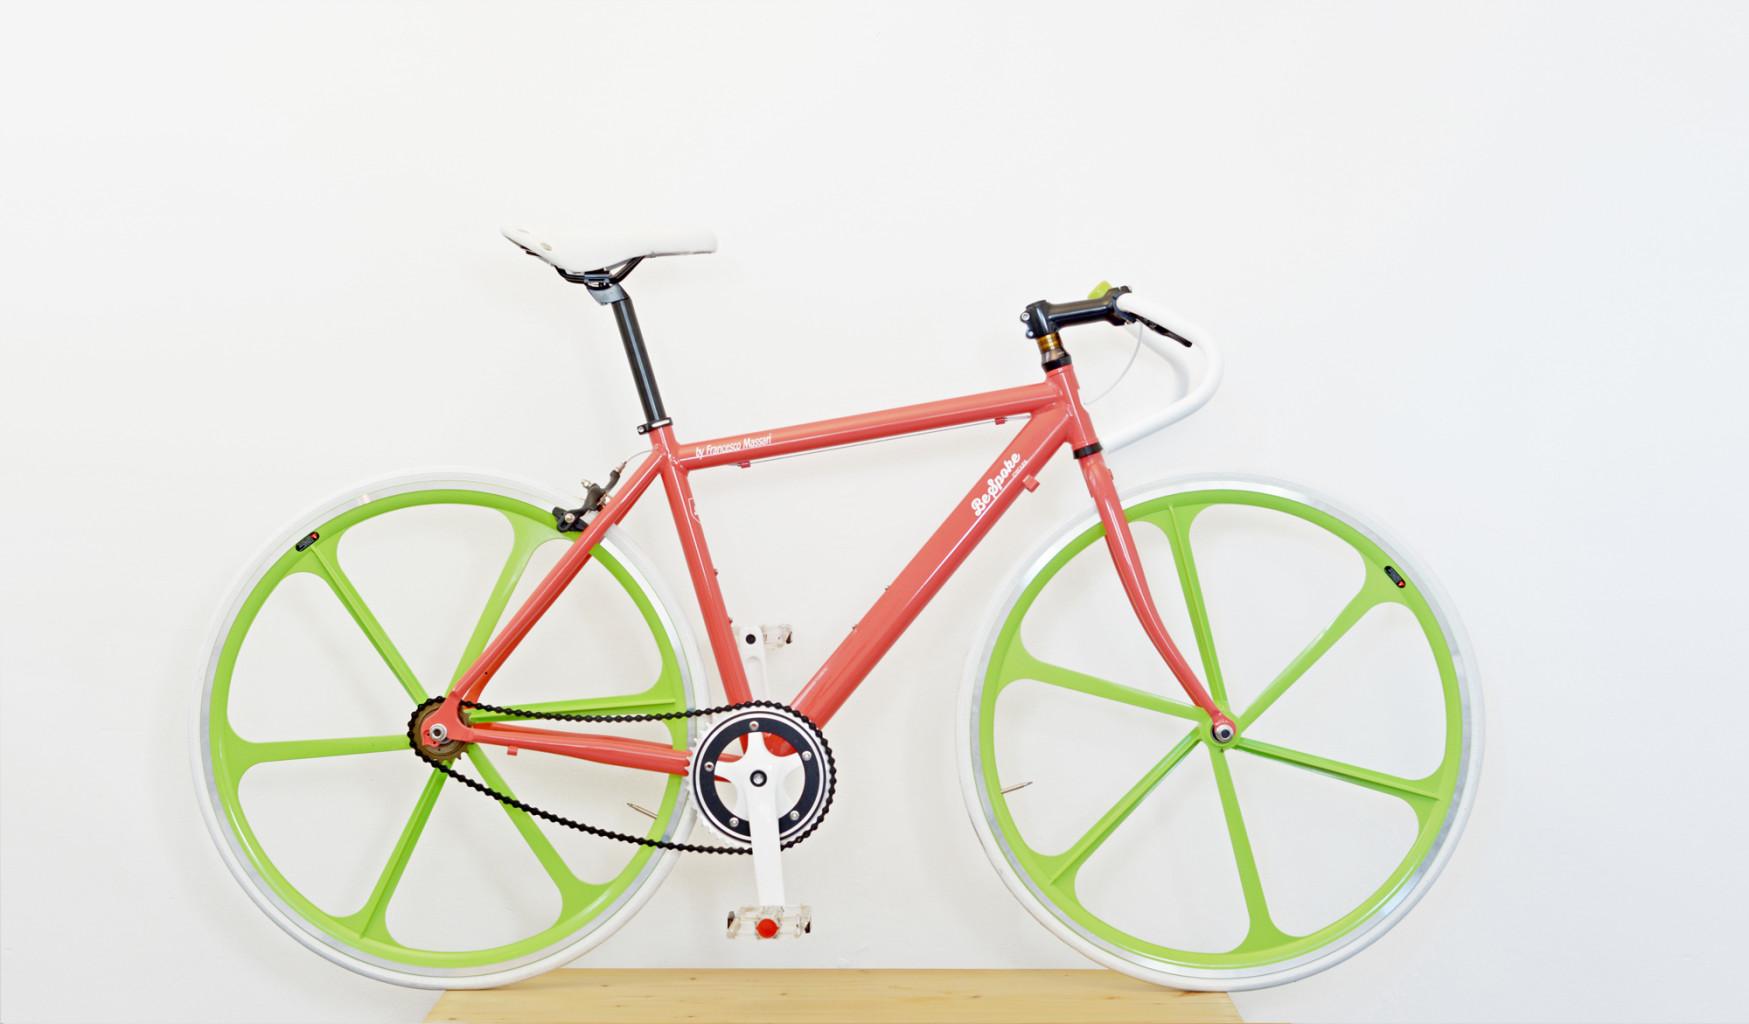 Bespoke bike 5